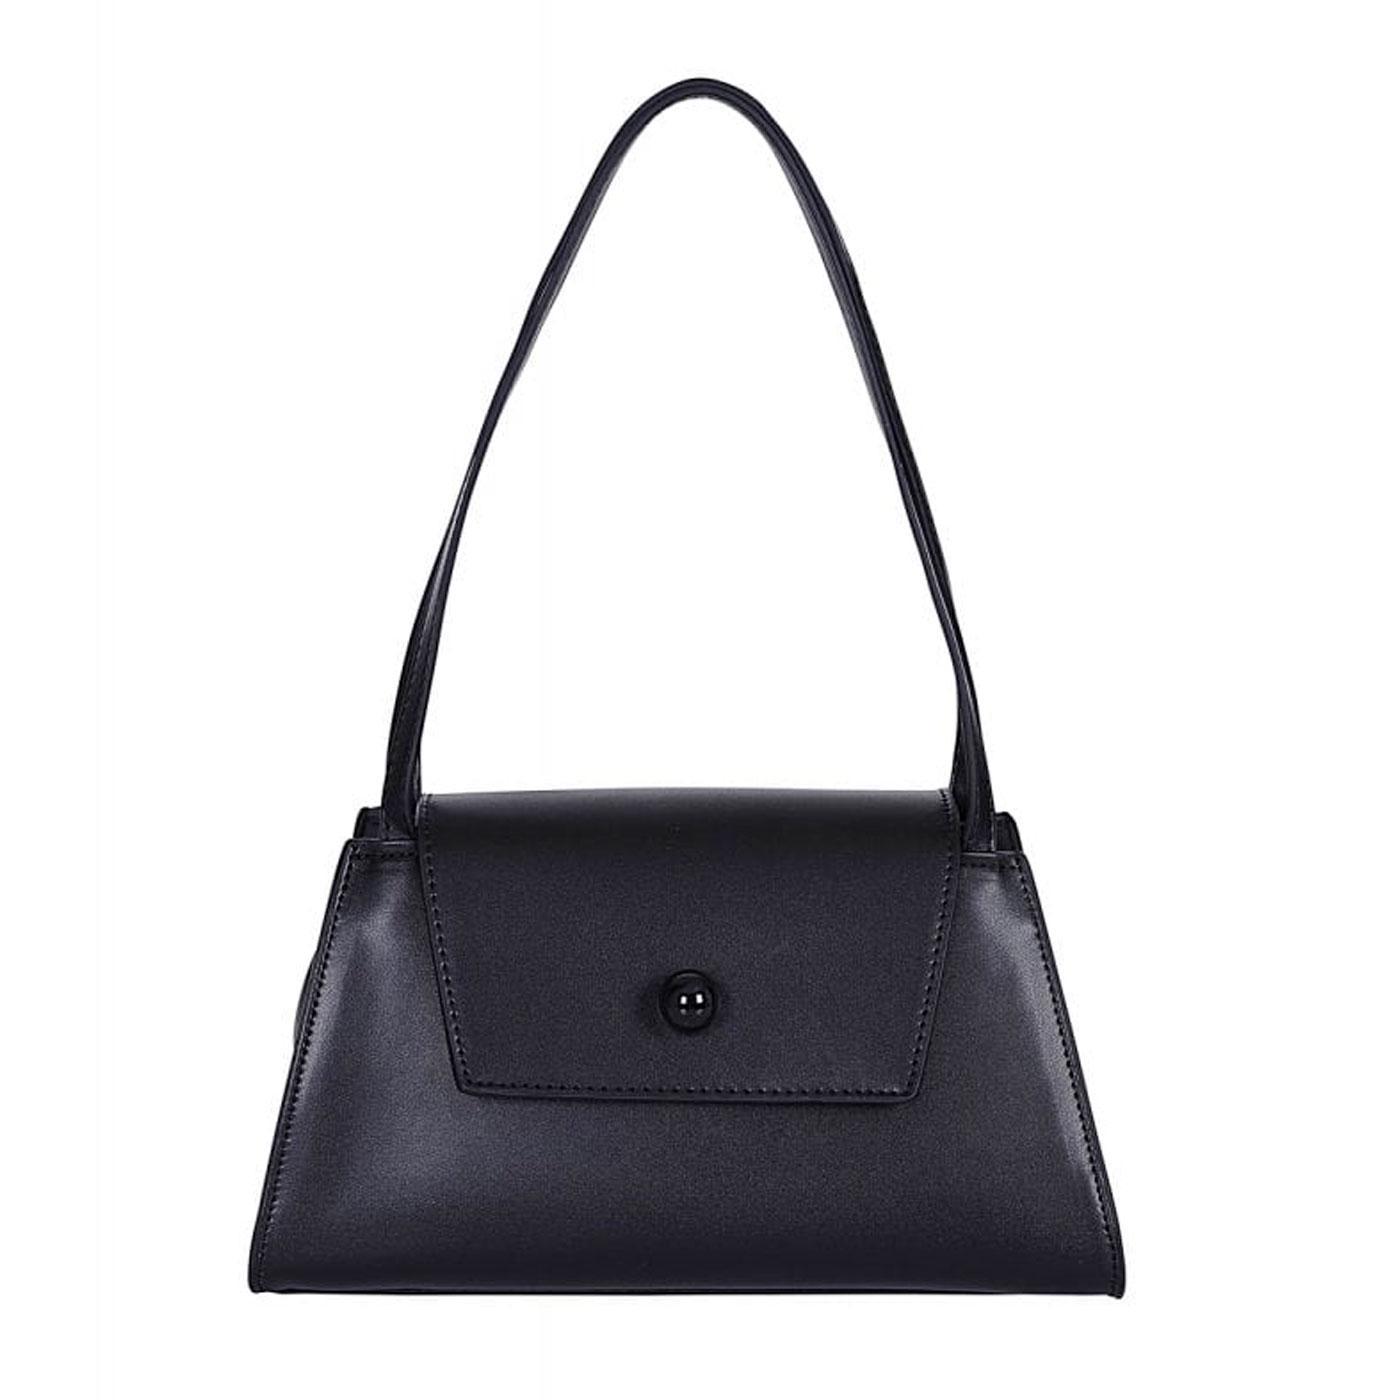 Sasha COLLECTIF Vintage Faux Leather Handbag Black